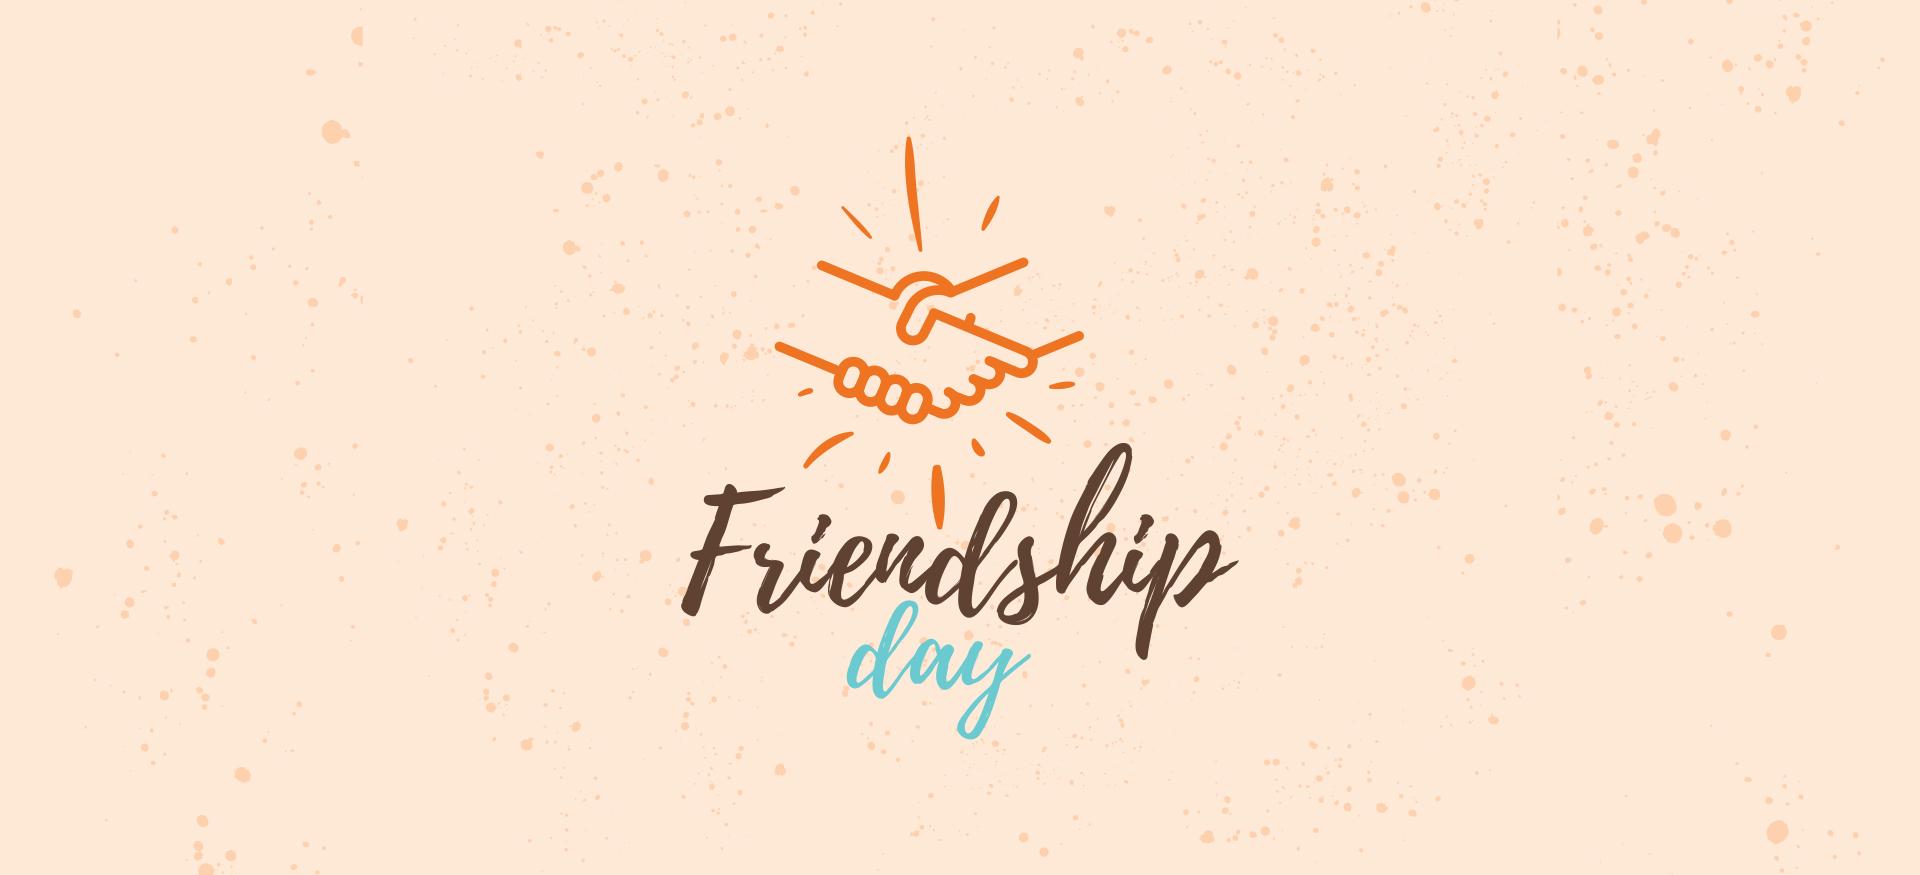 Celebrate Your Bond Of Friendship Indoors With A Rejuvenating Pamper Sesh!